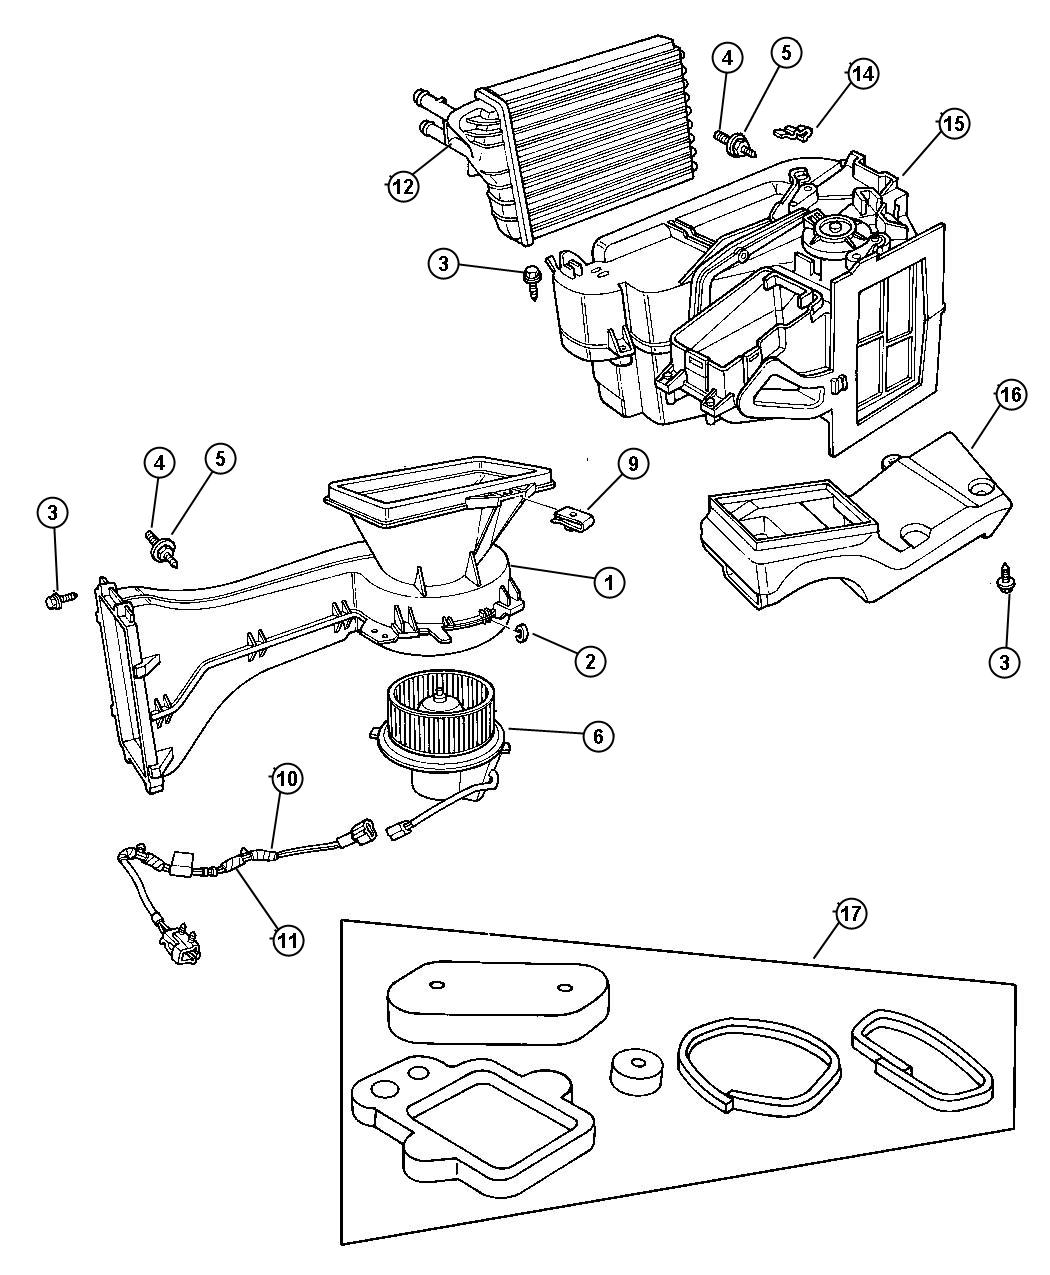 1998 Dodge Neon Motor package. Heater blower. Air